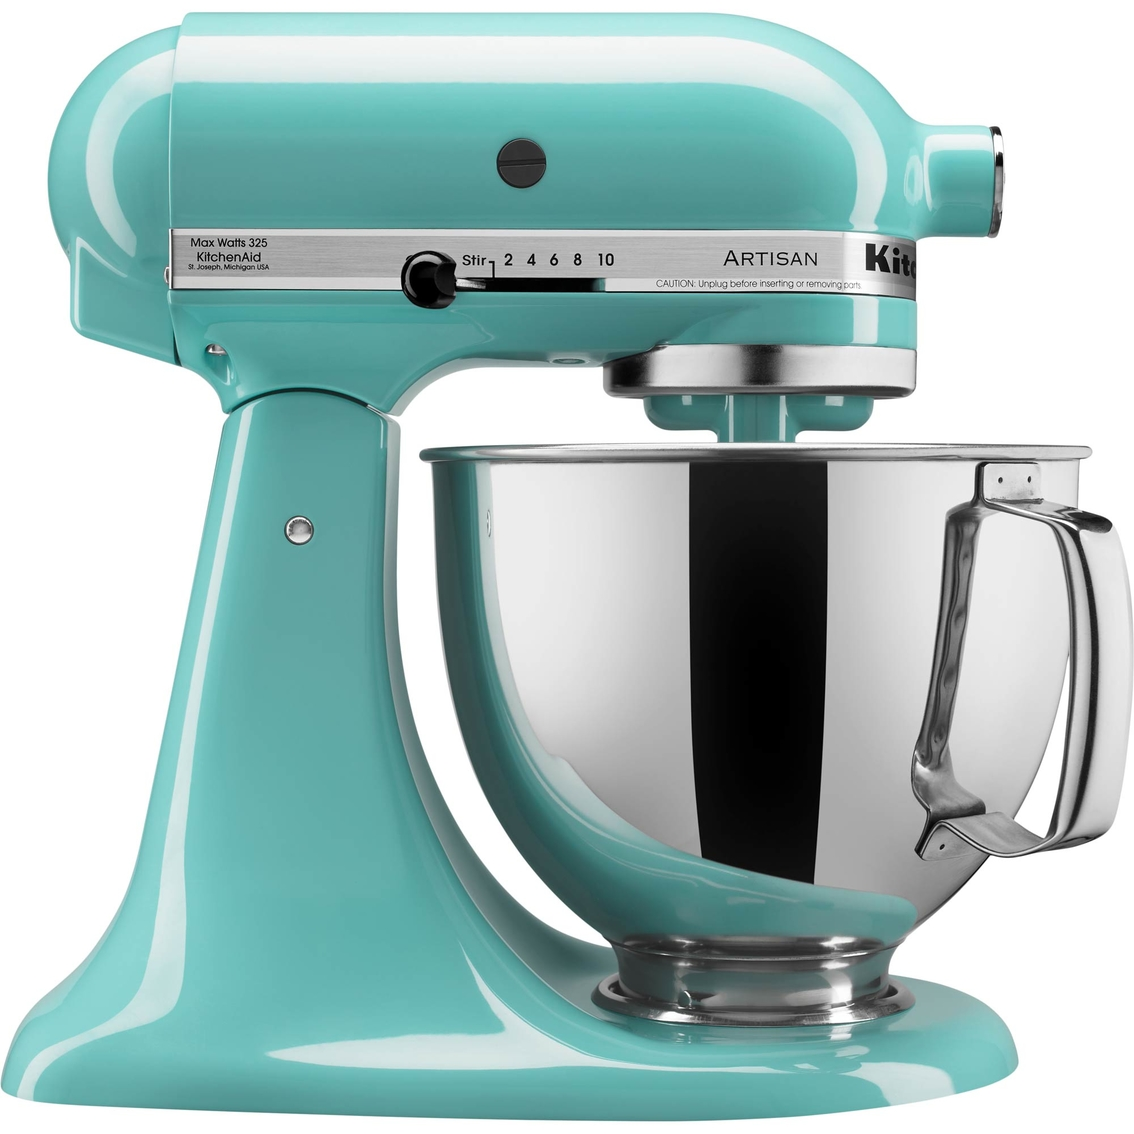 Kitchenaid Artisan 5 Qt. Stand Mixer | Stand Mixers | Home ...